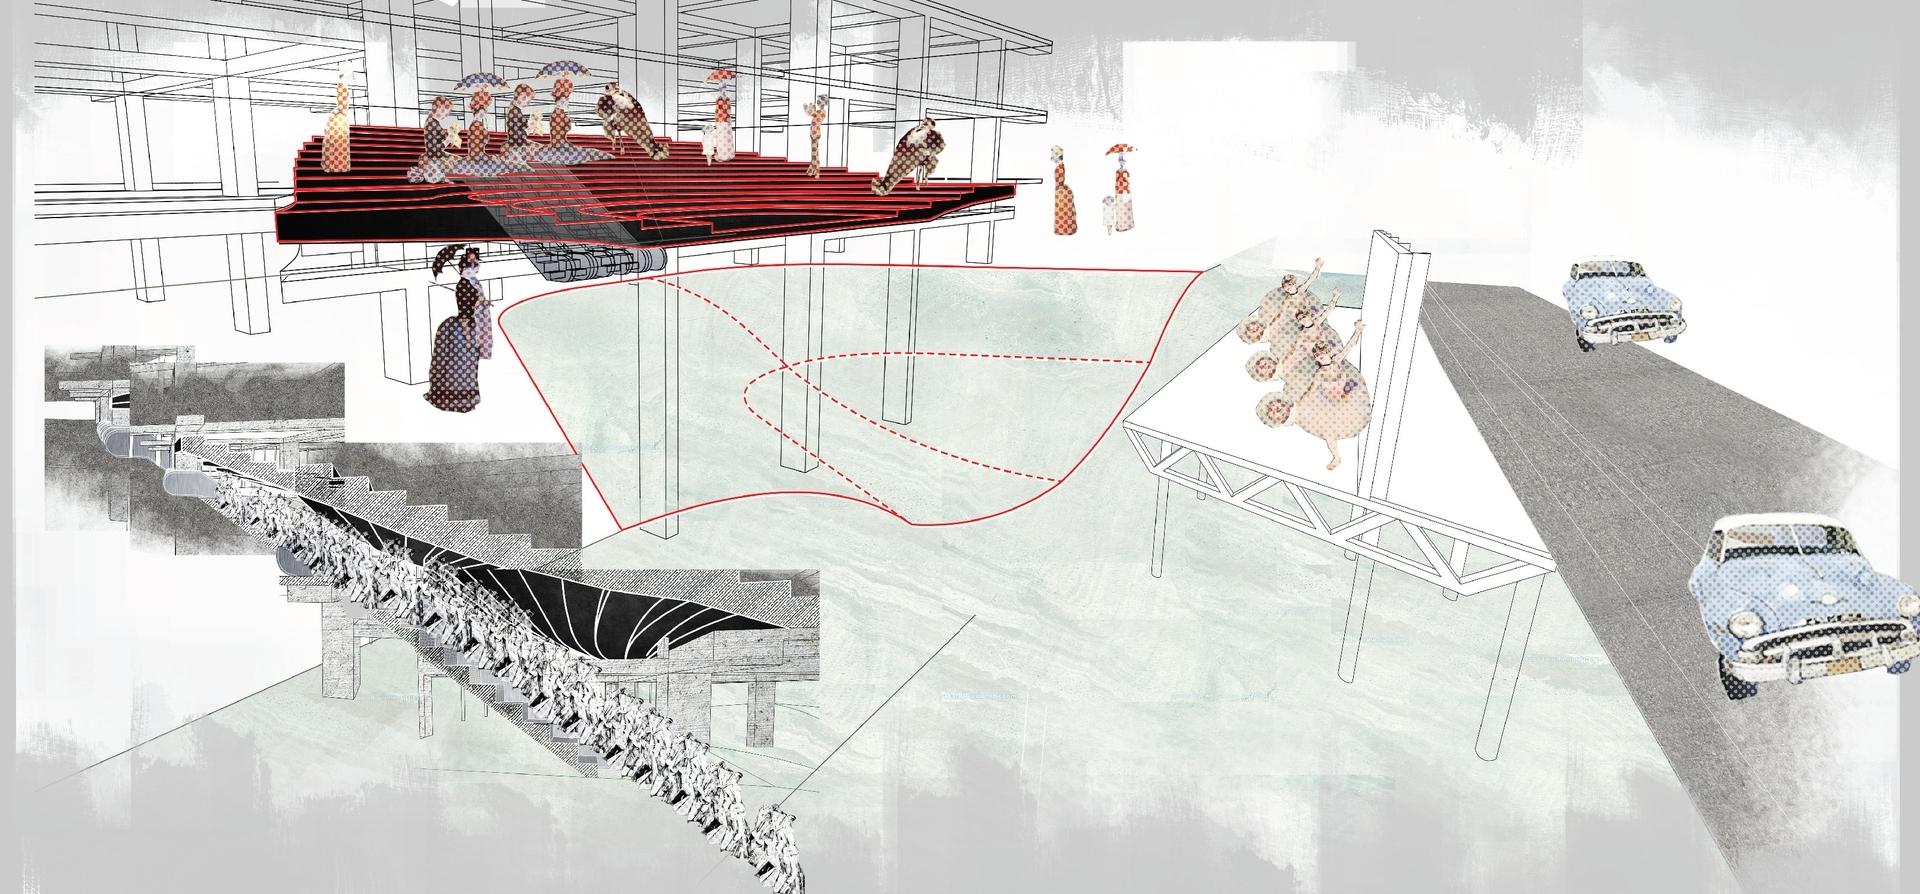 Enlarge Photo: Architecture as Art Medium: Theme Park of Architectural Phenomena 9